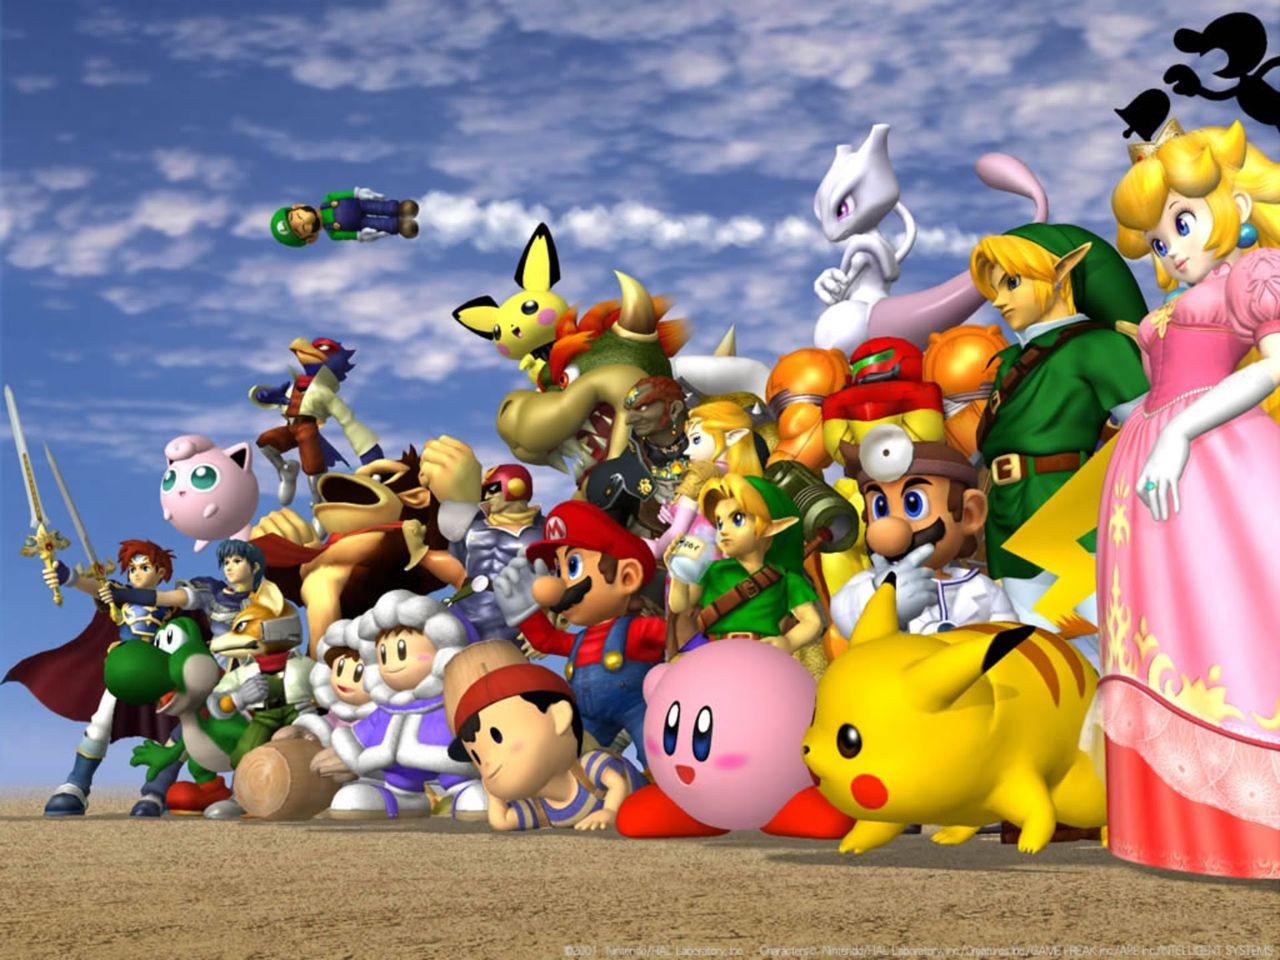 Dreamhack anordnar turnering i Super Smash Bros. Melee